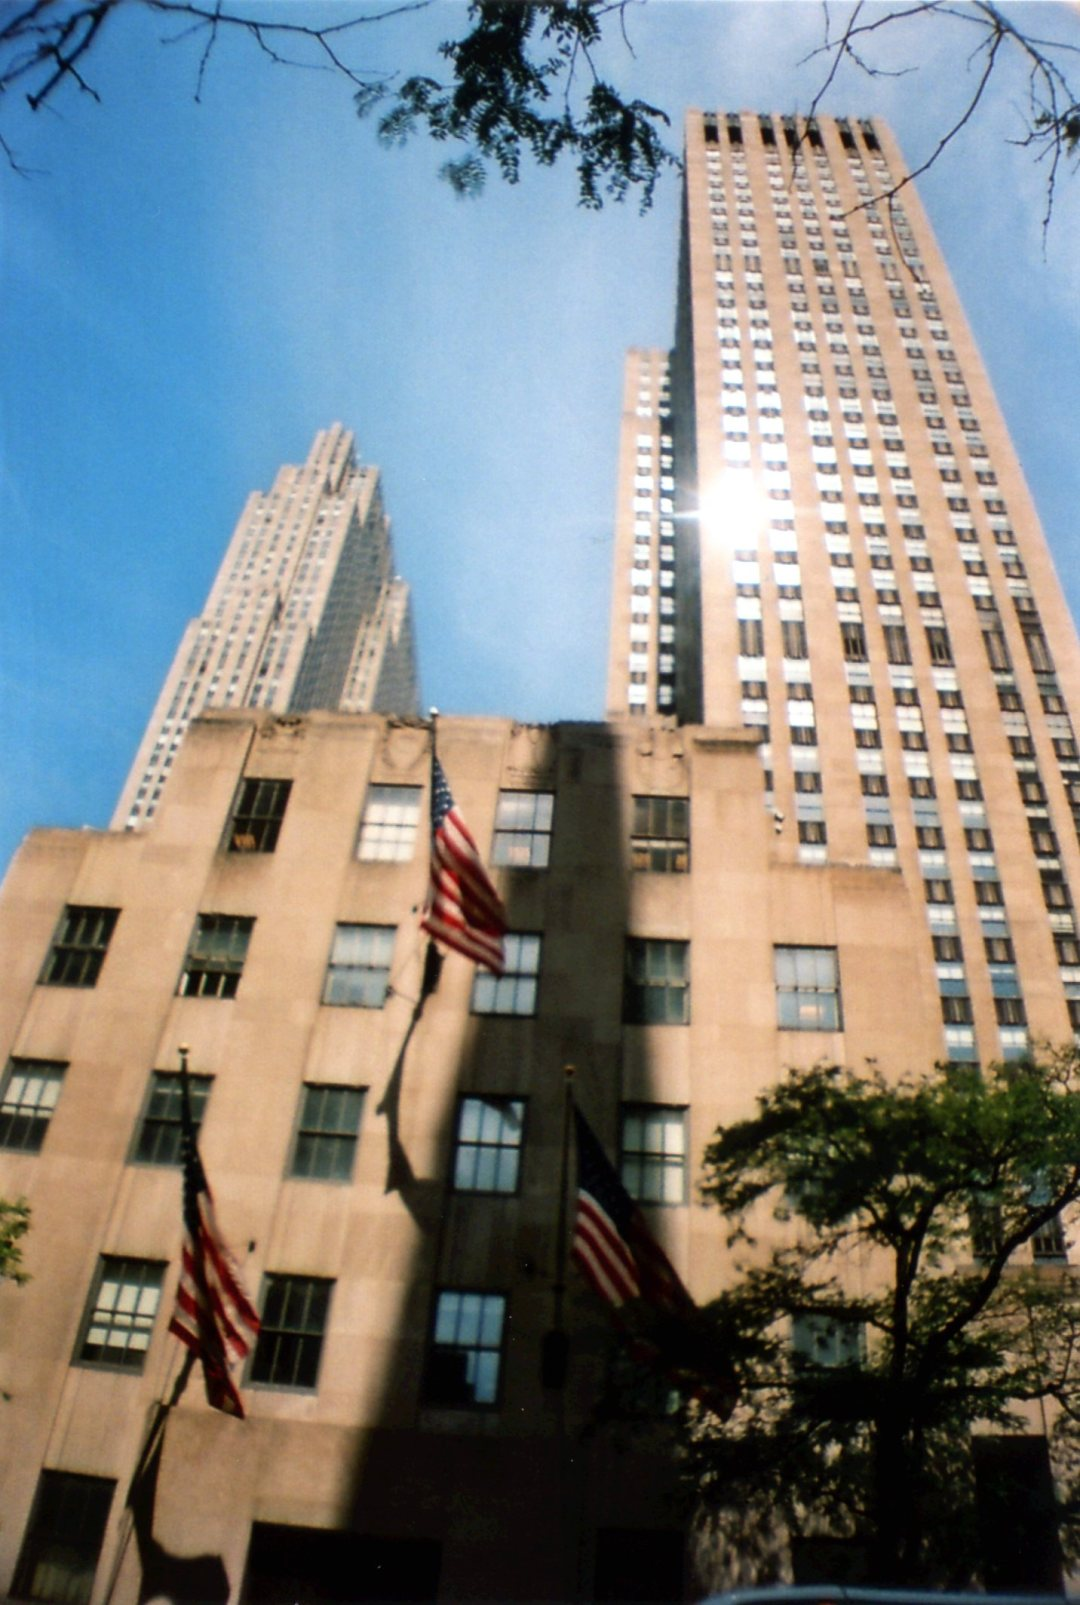 New York buildings sardina